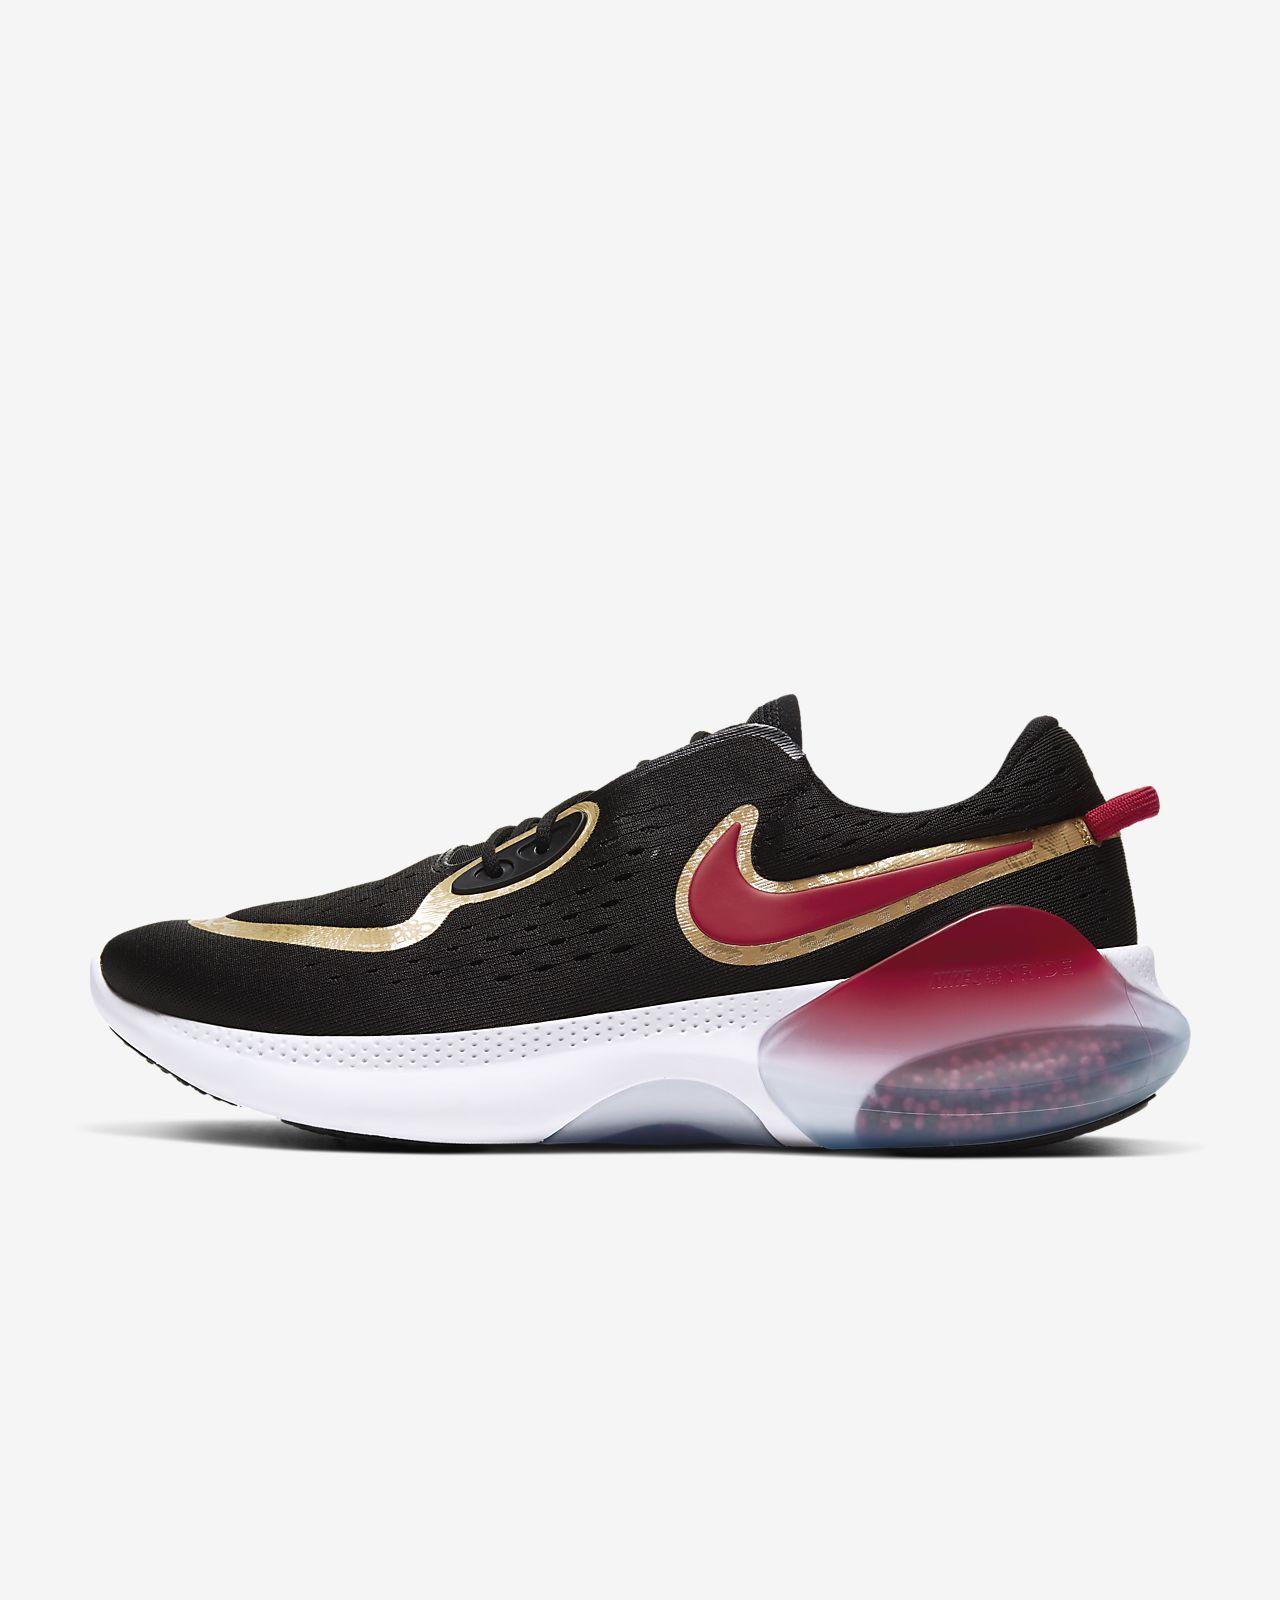 Chaussure de running Nike Joyride Dual Run pour Homme